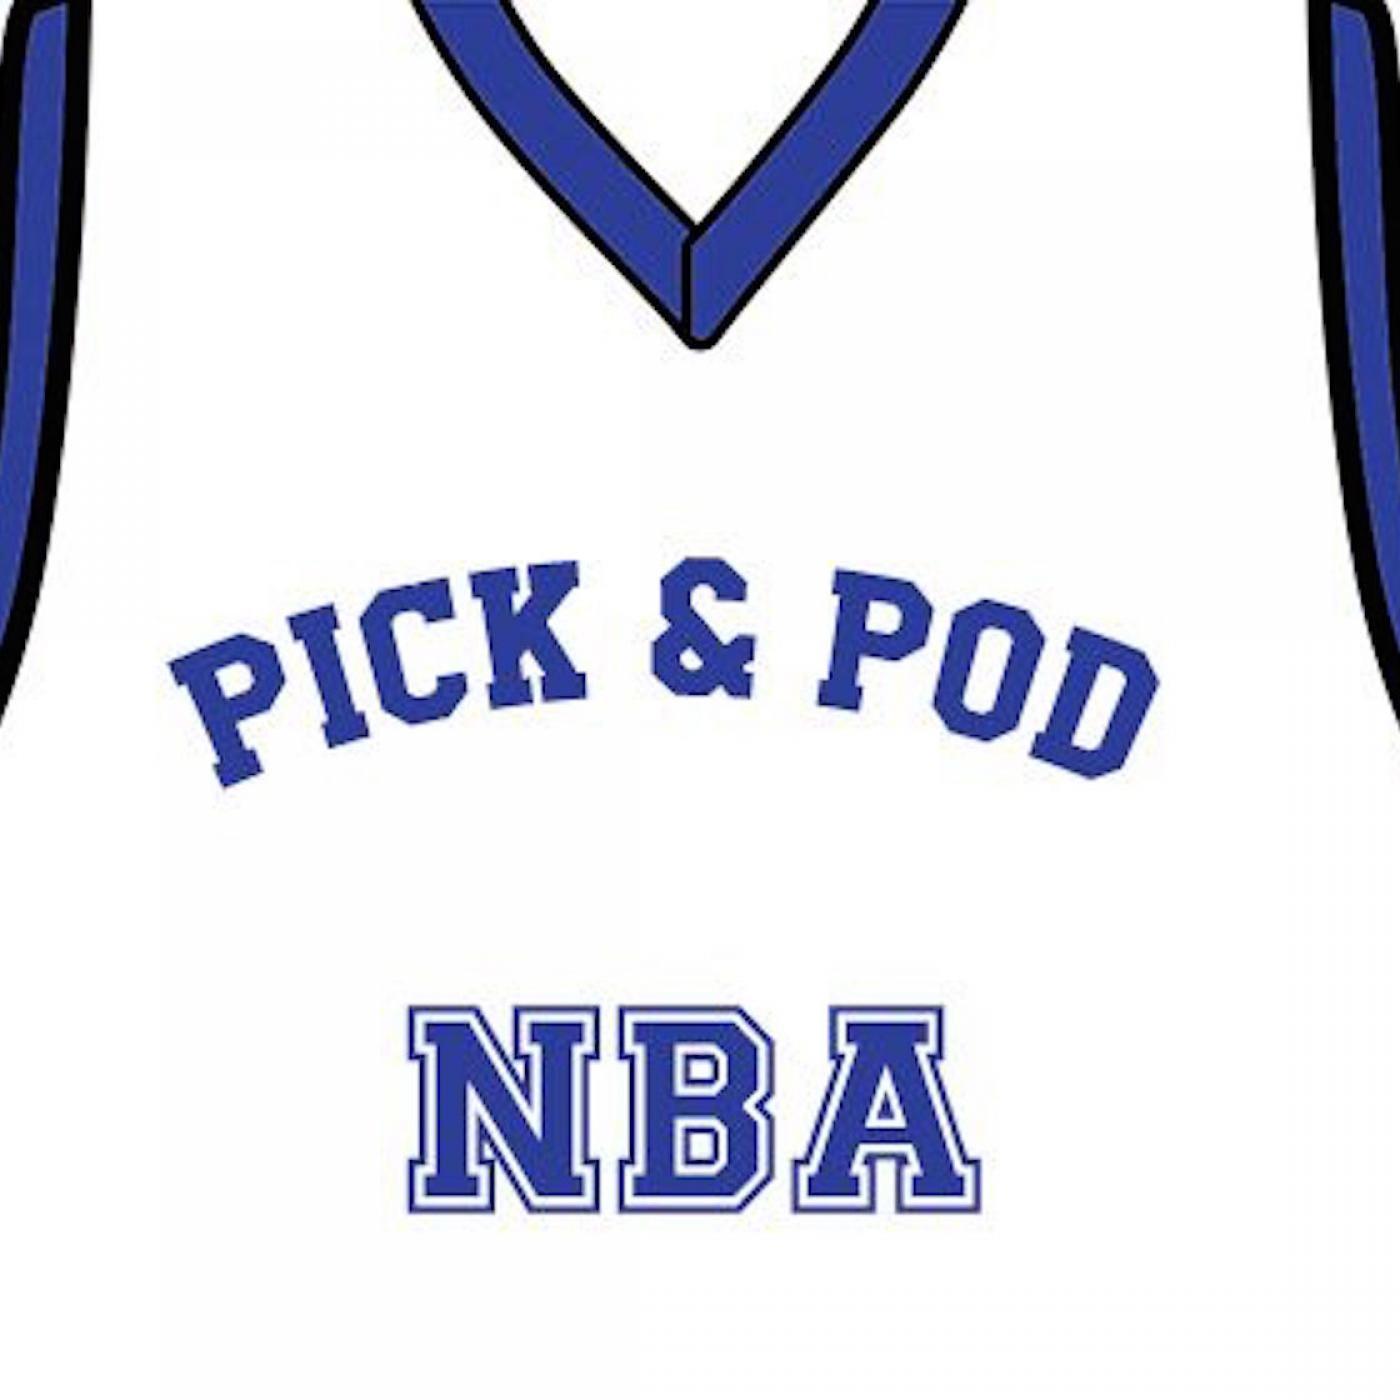 <![CDATA[Pick&Pod NBA]]>